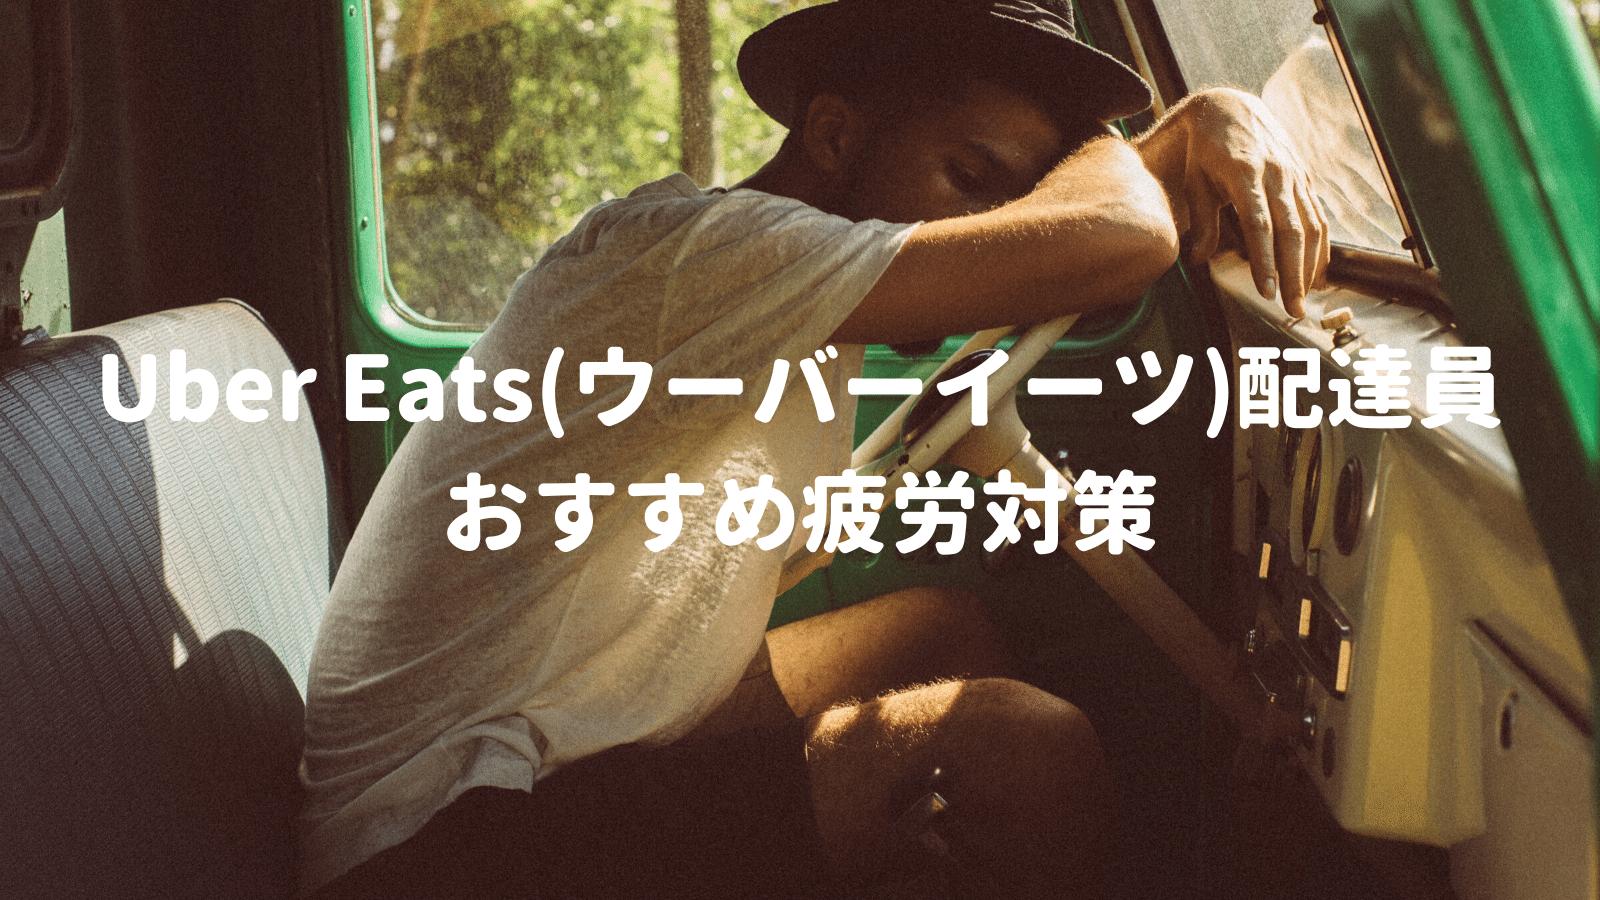 Uber Eats(ウーバーイーツ)配達員おすすめ疲労対策!